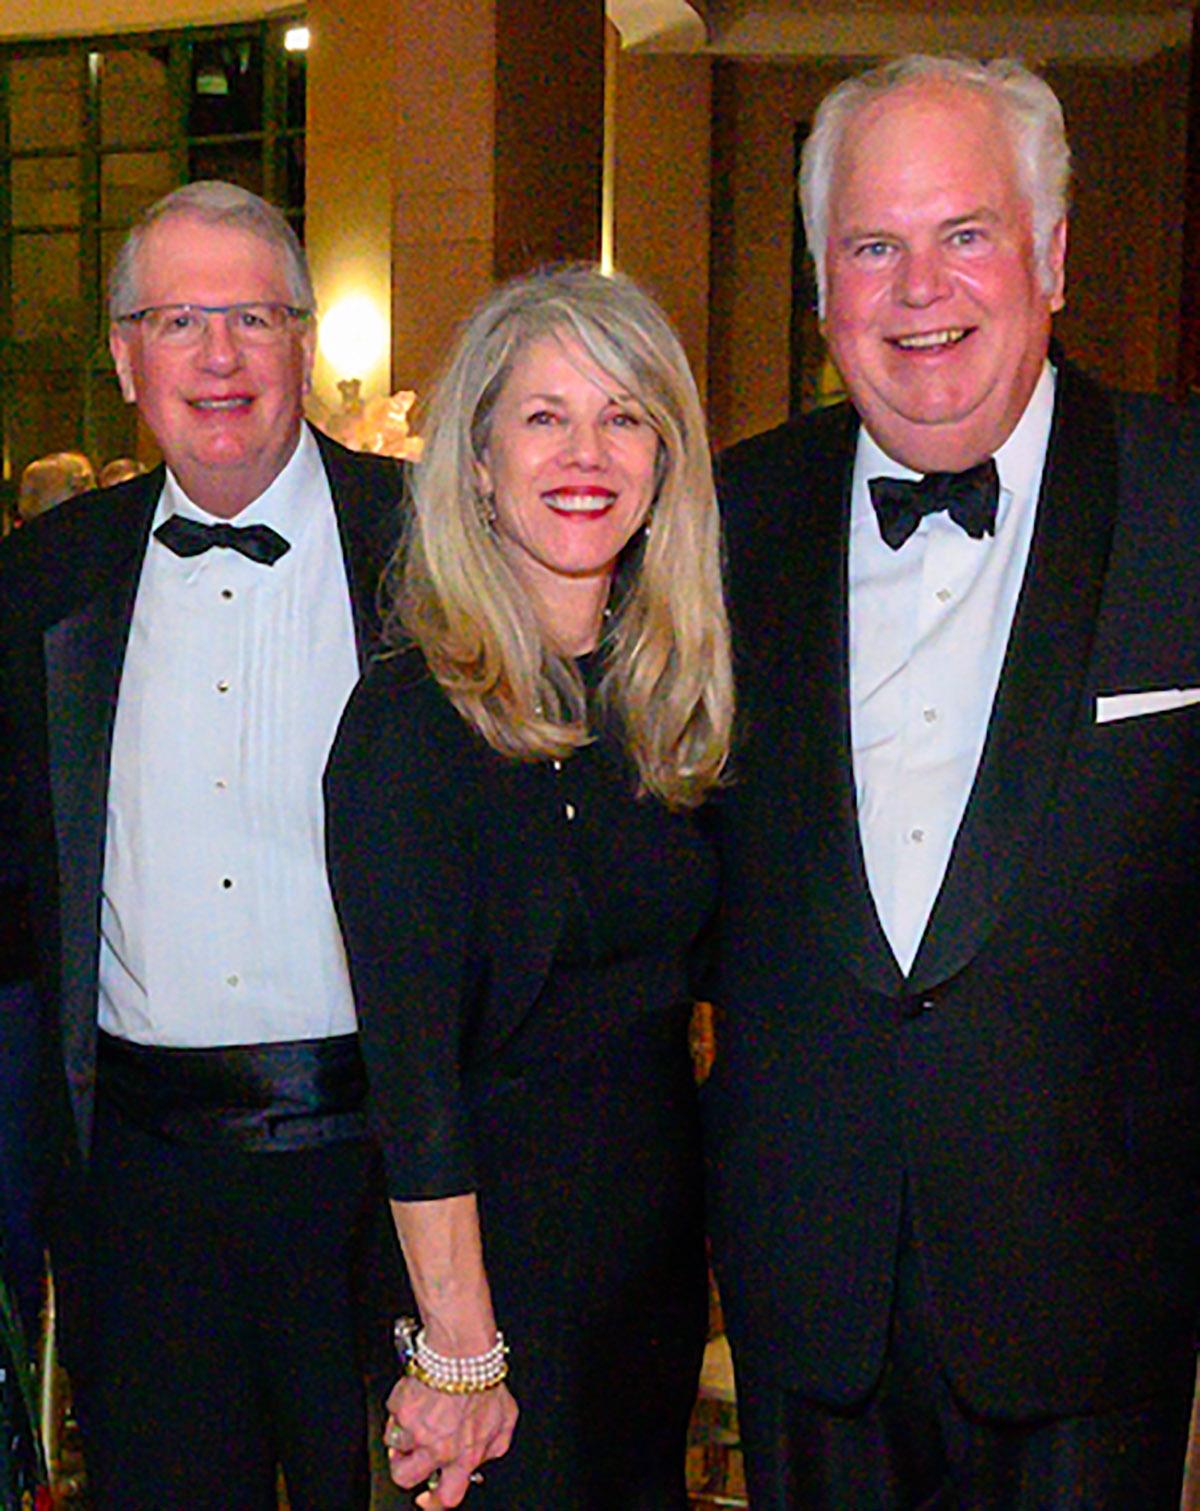 Dr. Randal Weber, Dr. Jane Edmond and Mark Davis